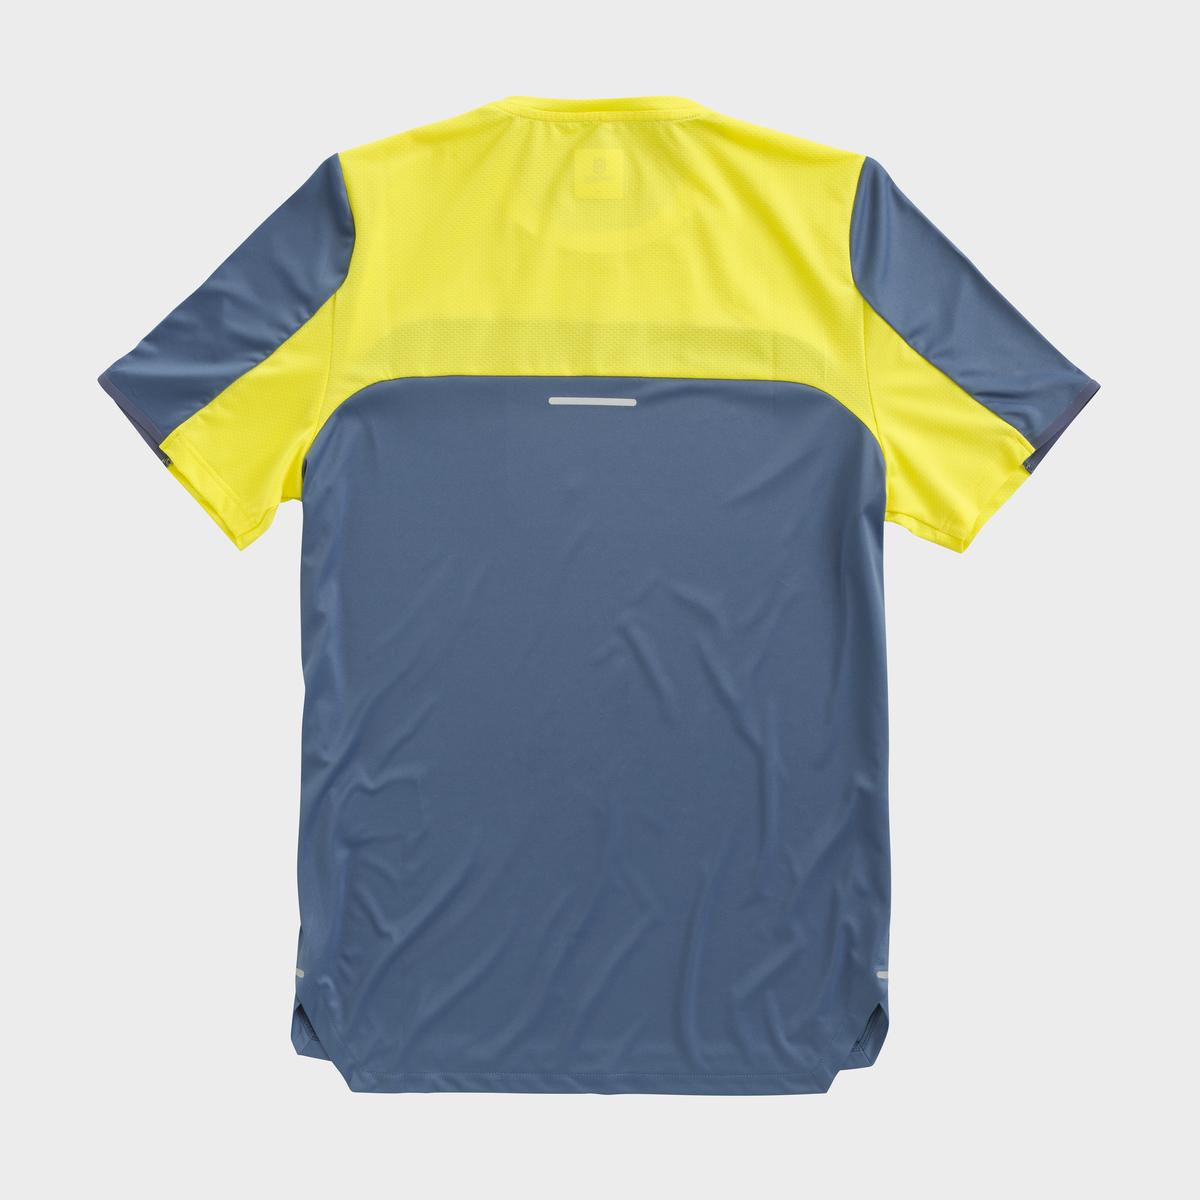 Husqvarna Mens Accelerate Tee T-Shirt